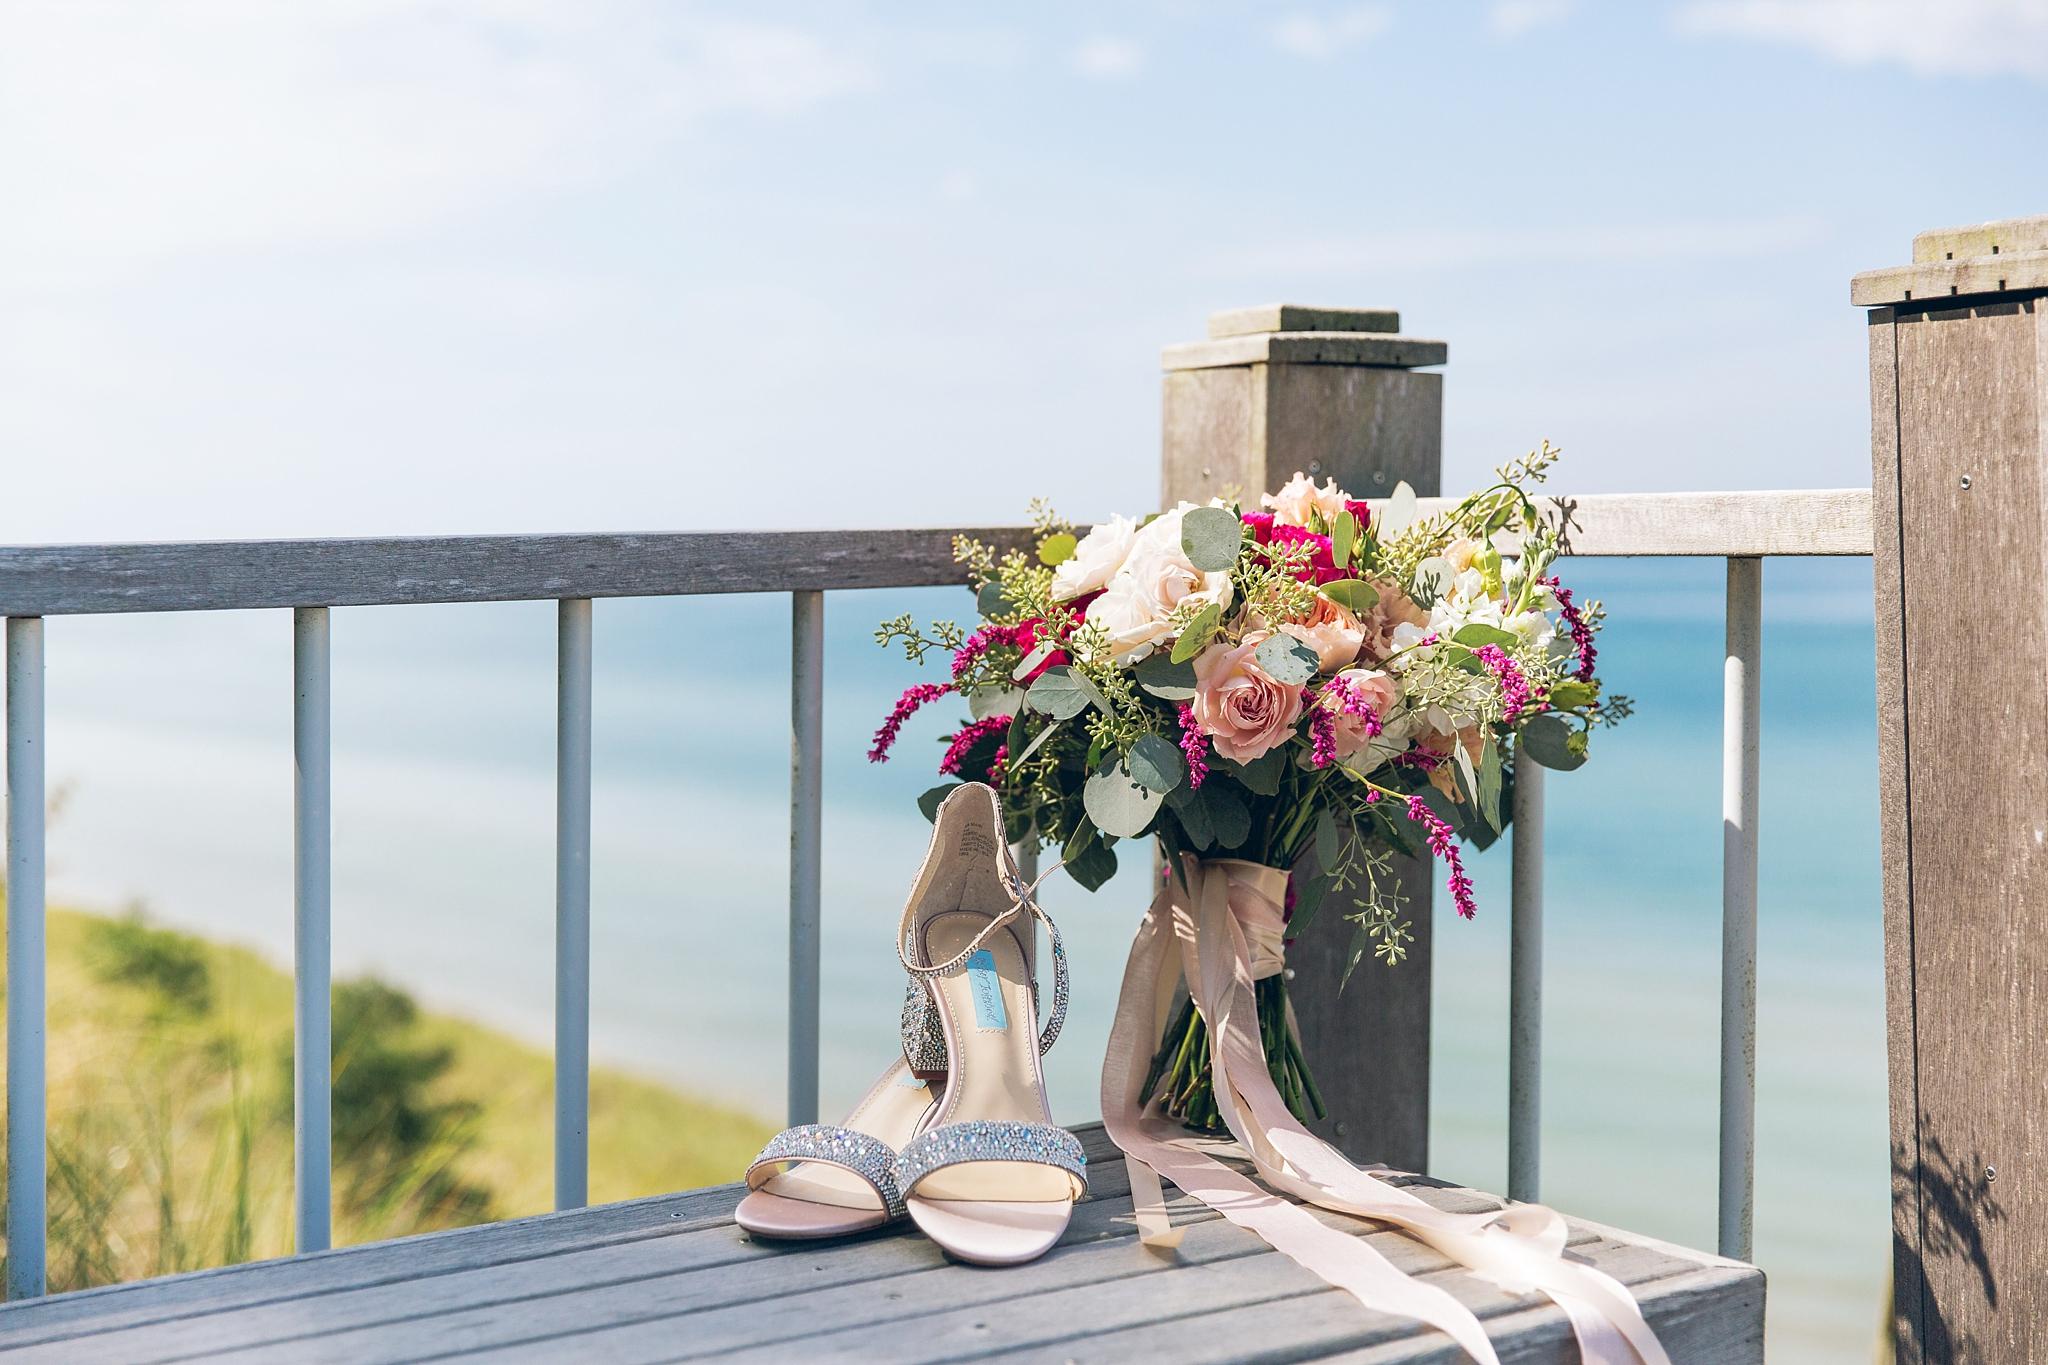 baker-lofts-holland-michigan-wedding-photographer_0294.jpg